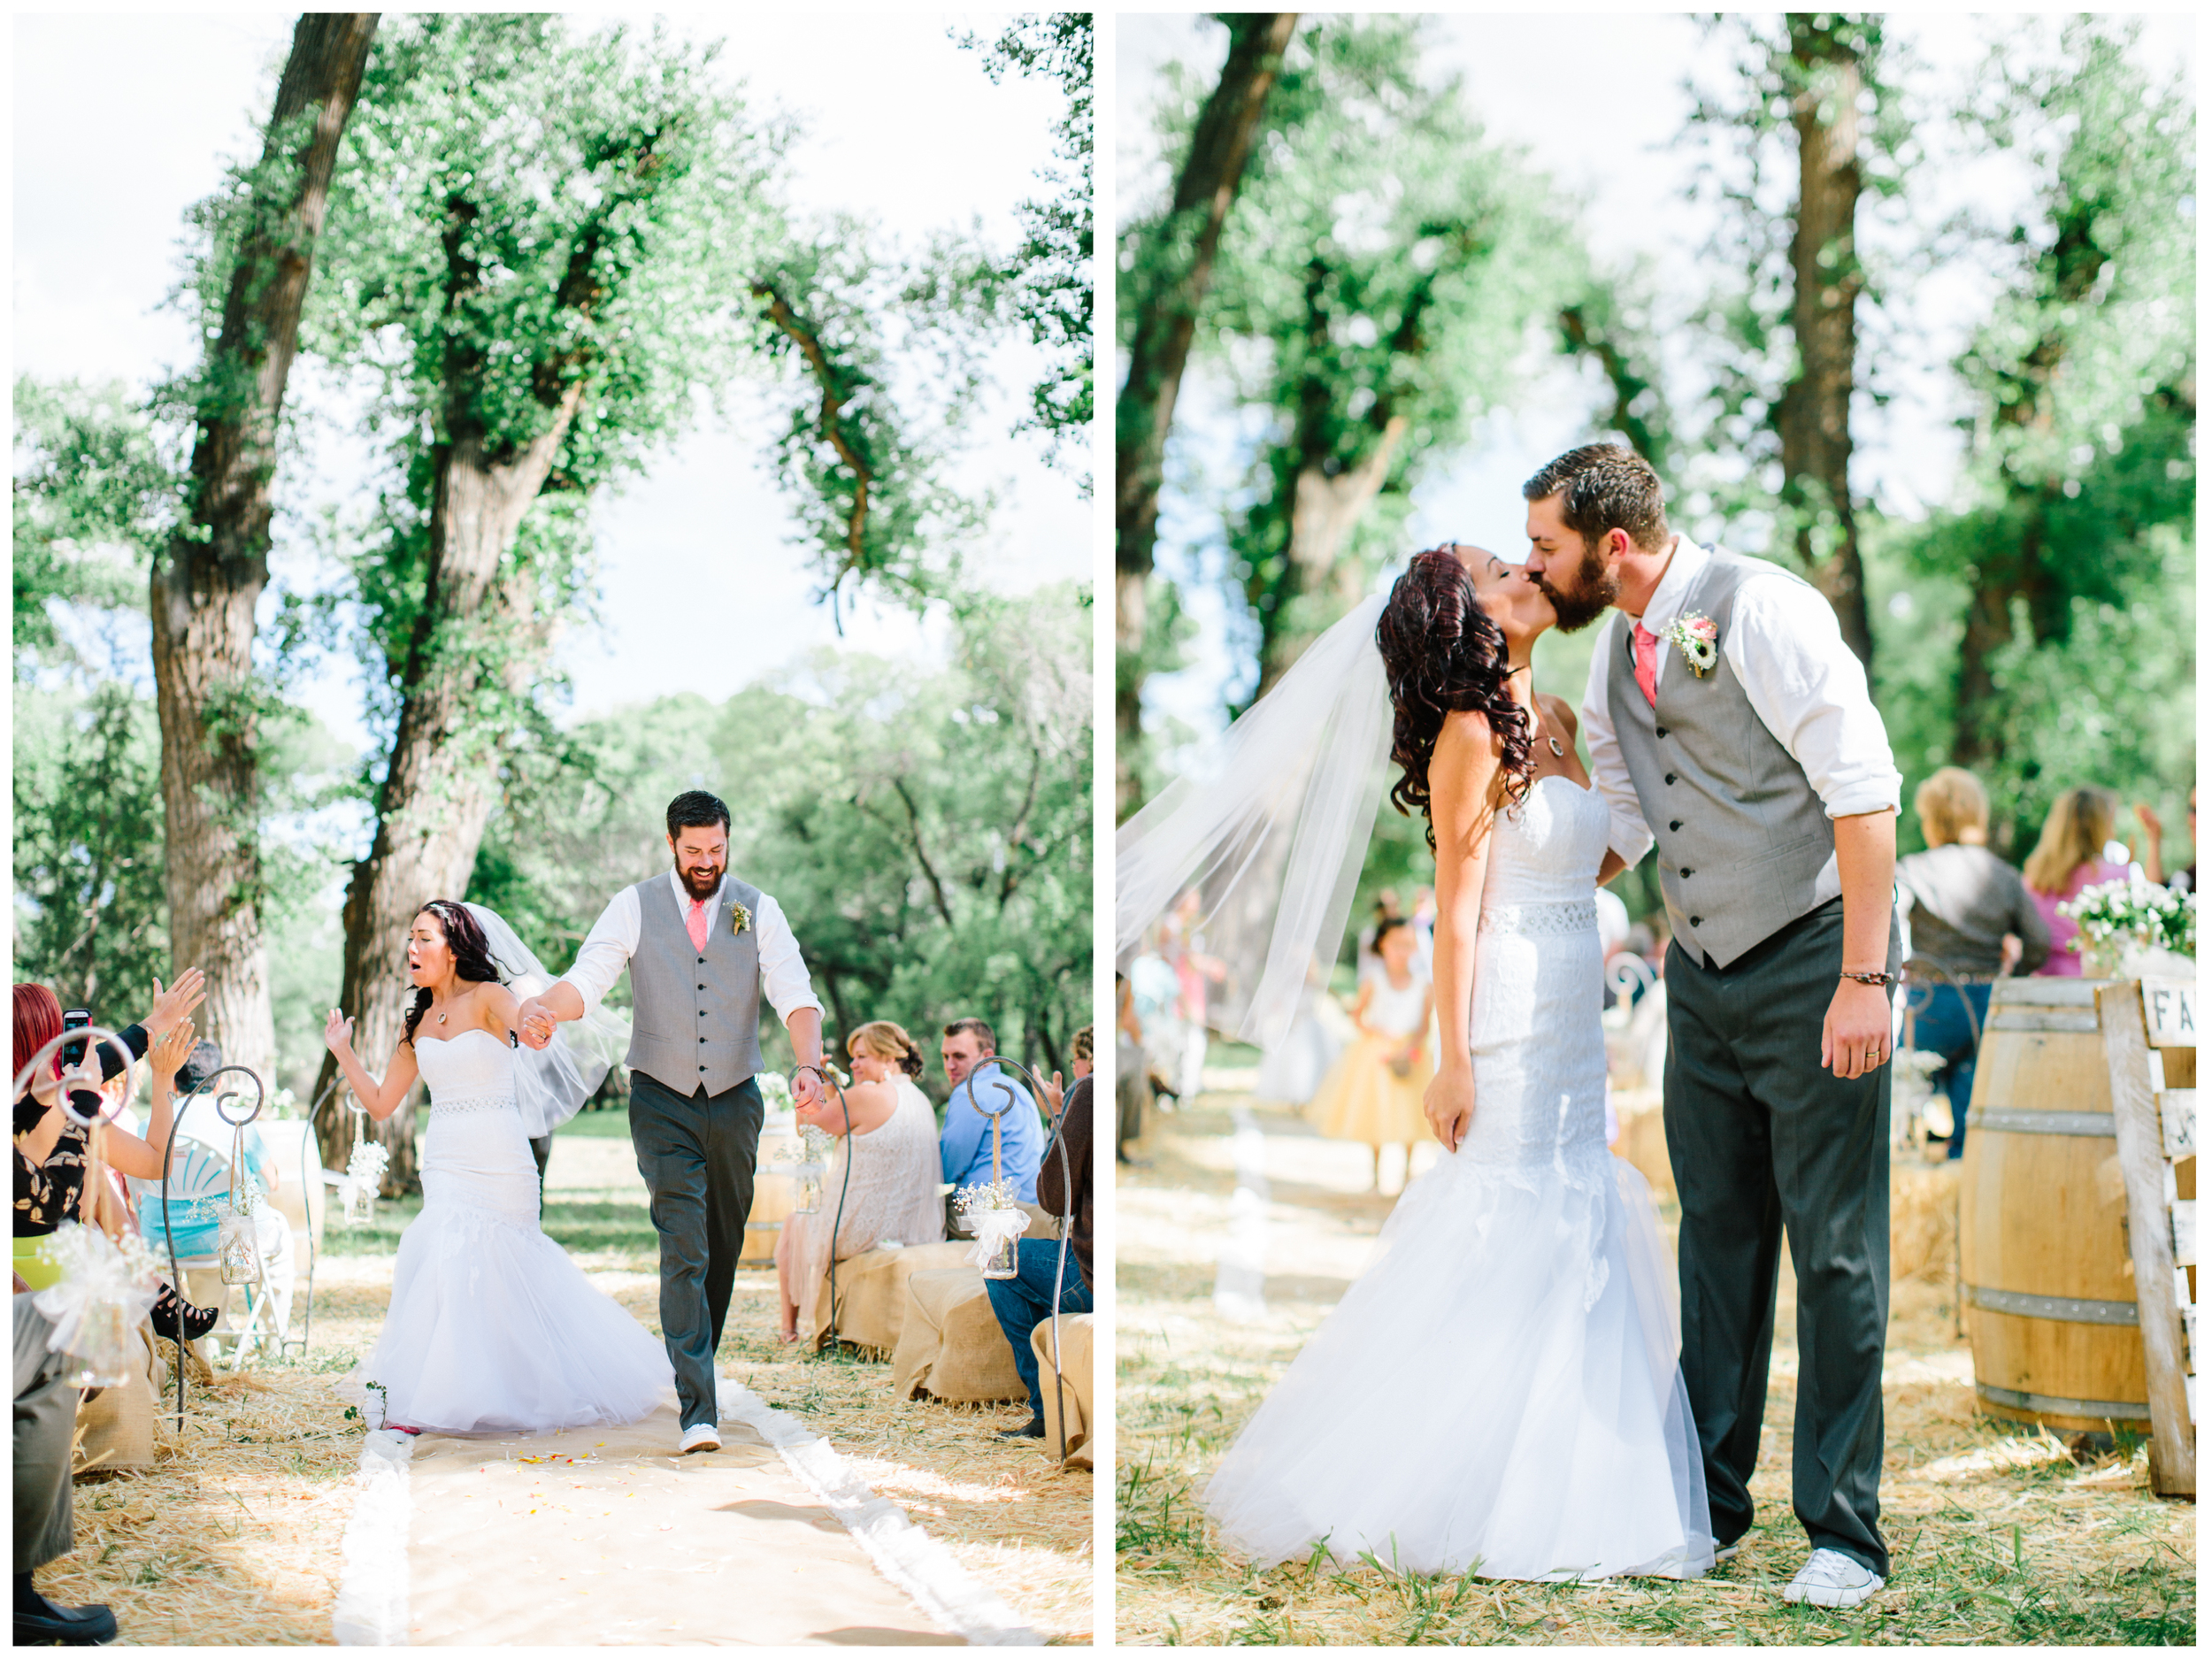 Prescott-Wedding-Photographer-Dip-3.jpg